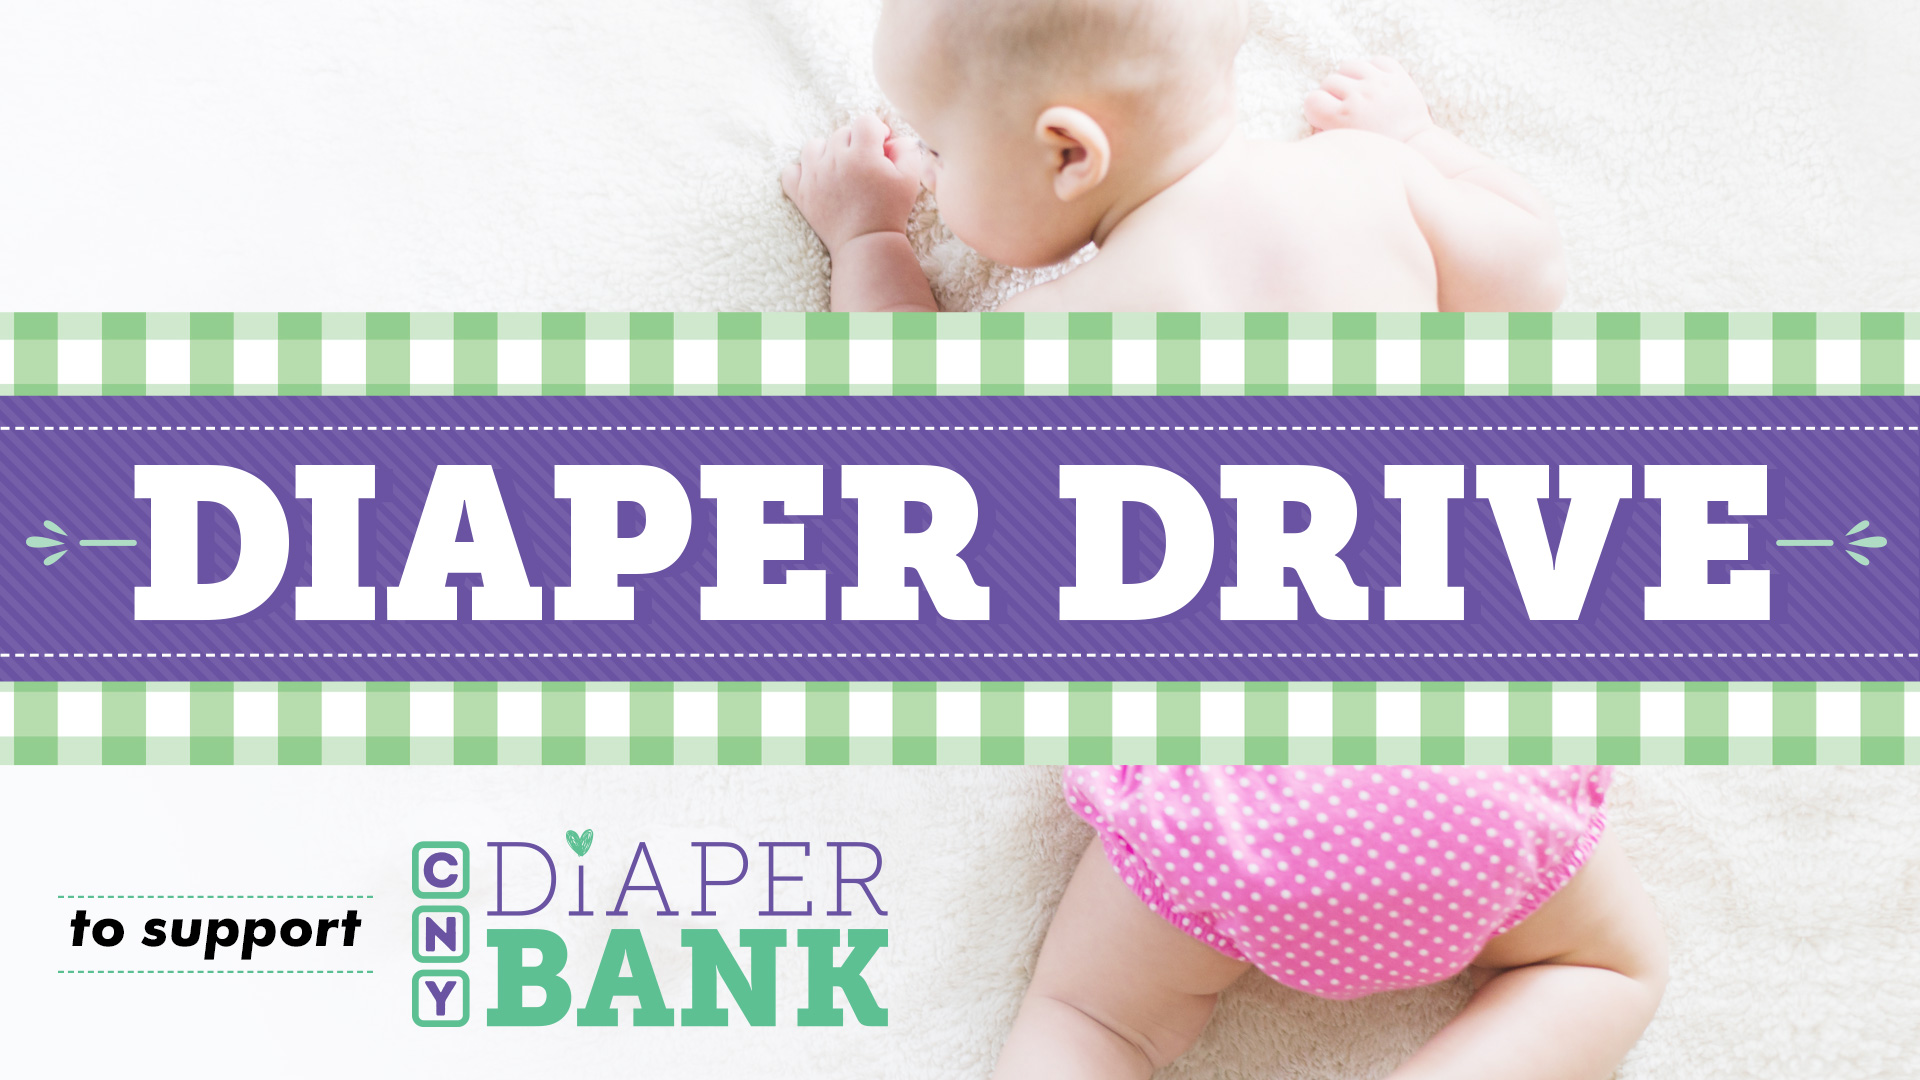 diaper-drive-thumb.jpg